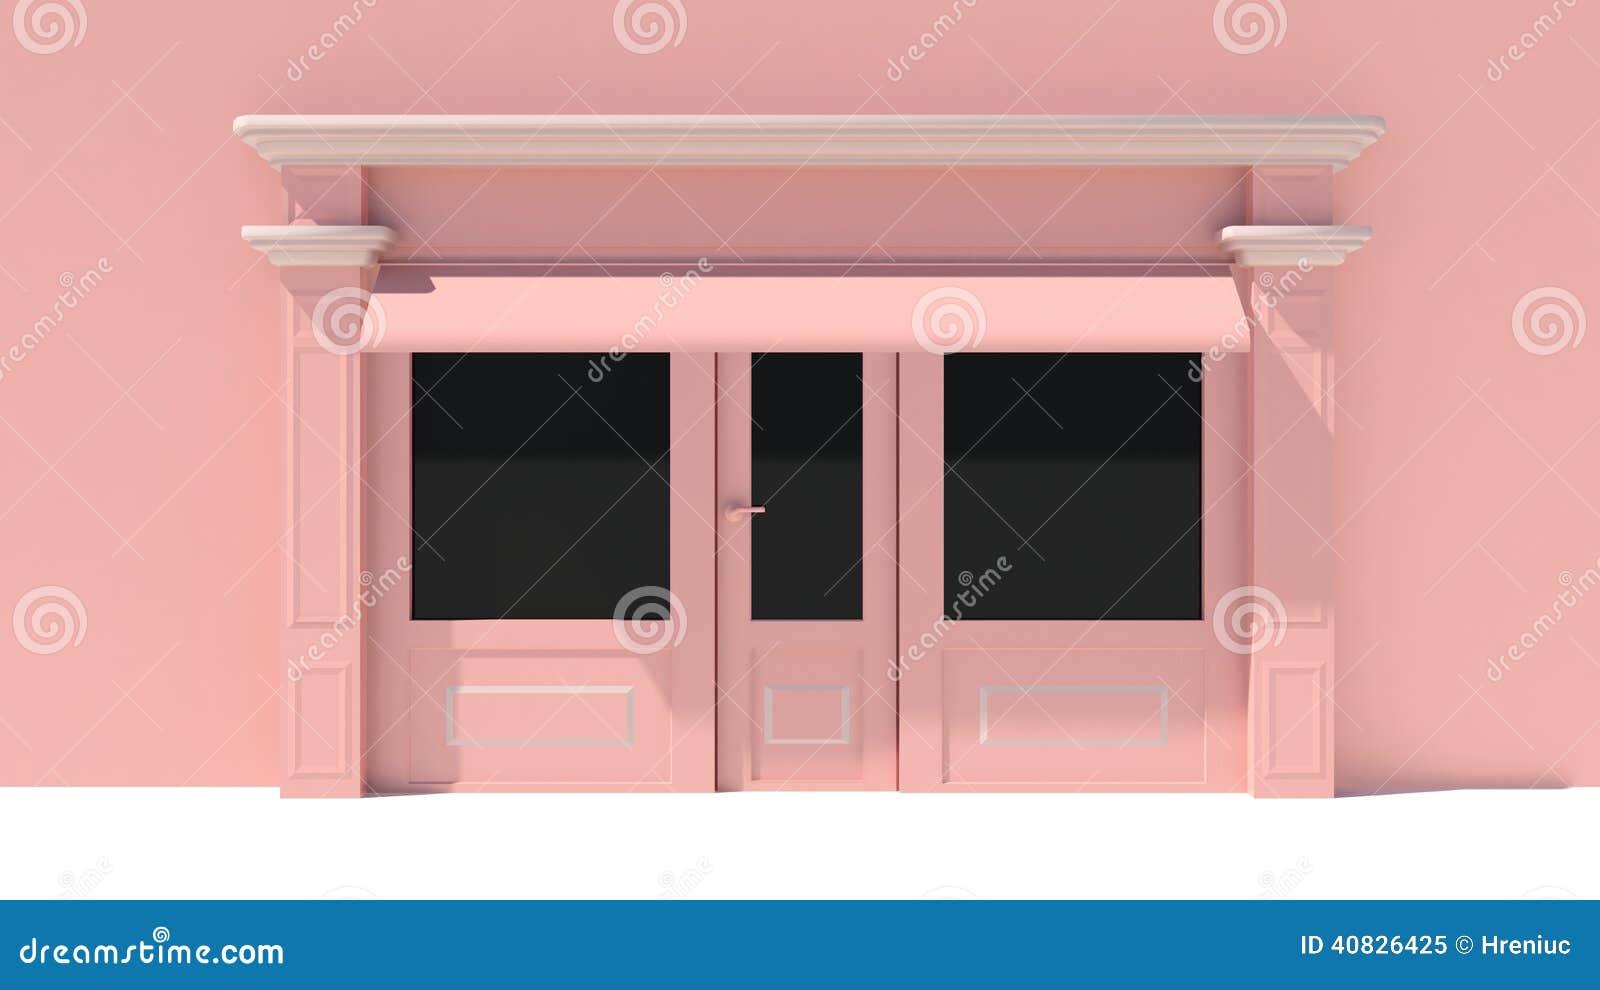 #85A526  as grandes janelas brancas e fachada cor de rosa da loja com toldos 1512 Toldos Para Janelas De Madeira